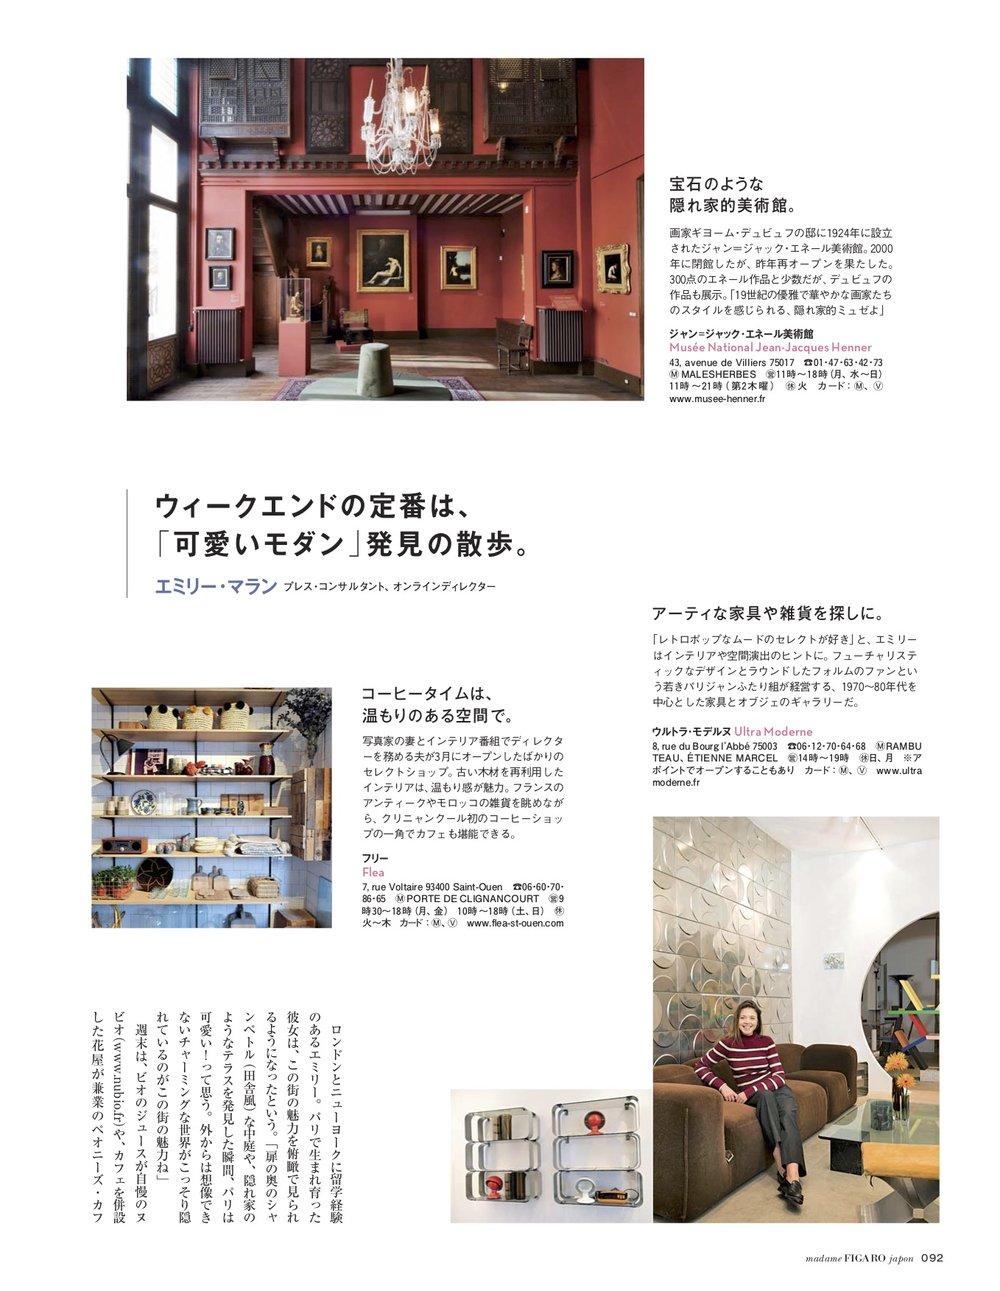 FIGARO MADAME JAPON article.jpg